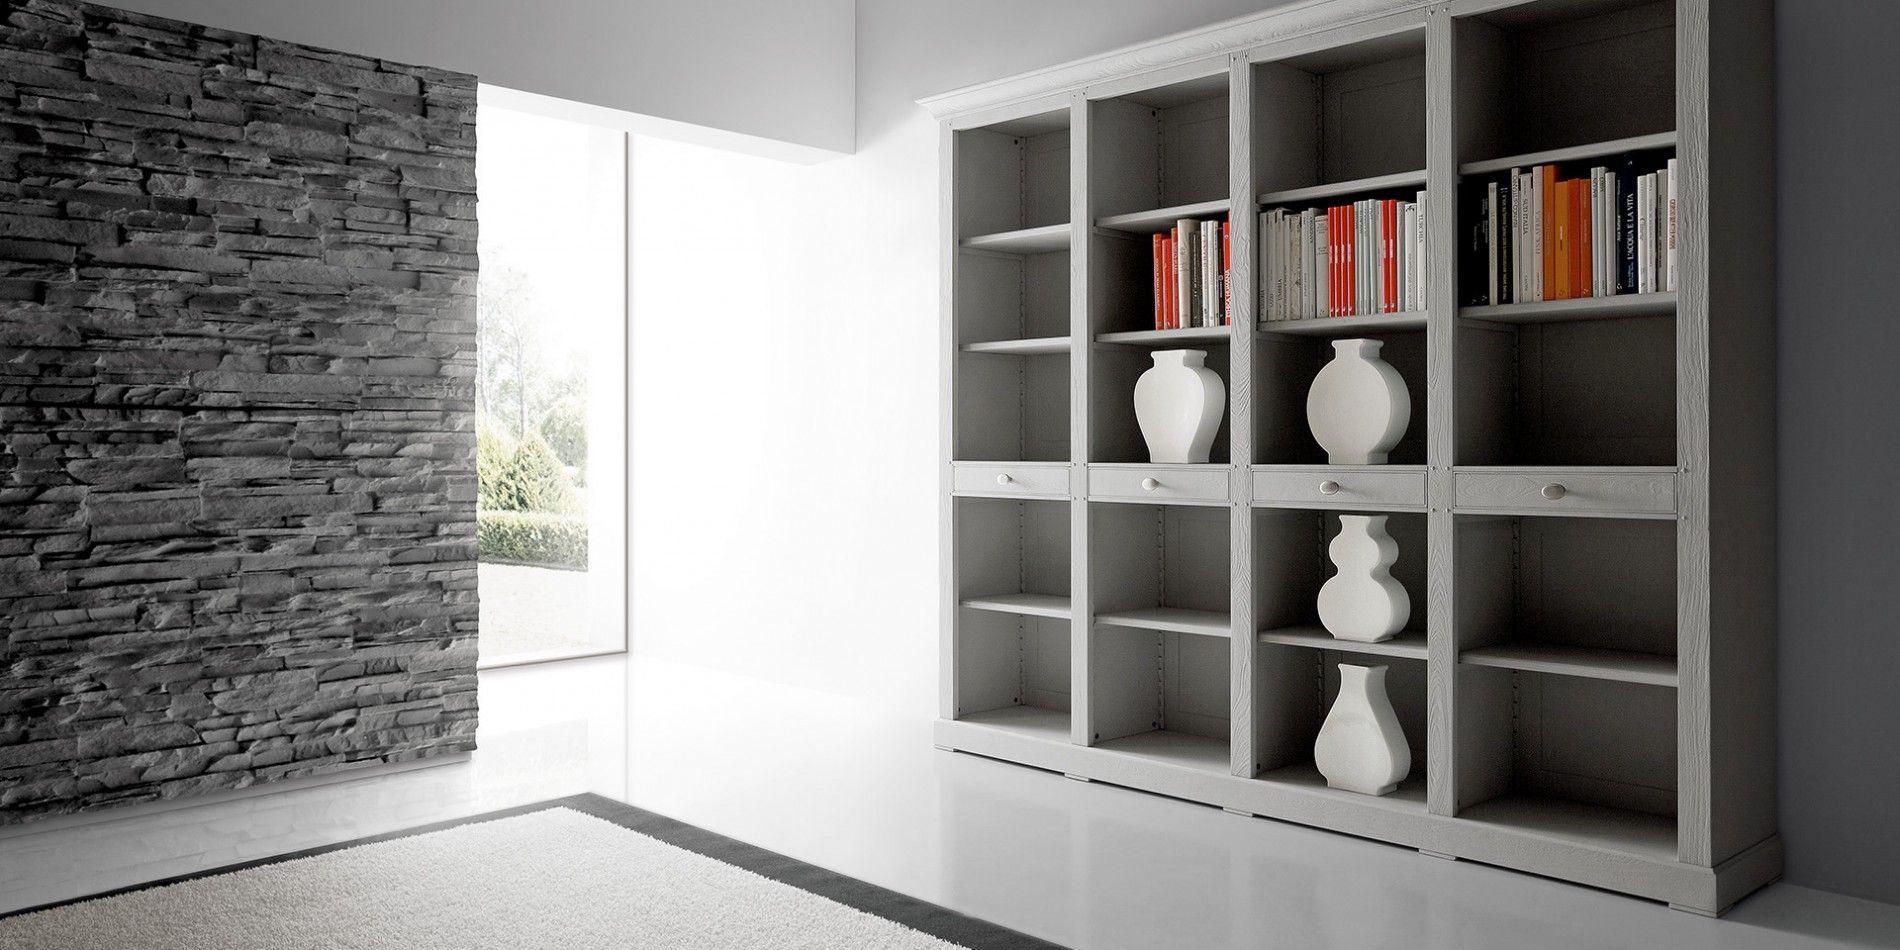 Shop arredamento online teaser principale with shop for Saldi arredamento online